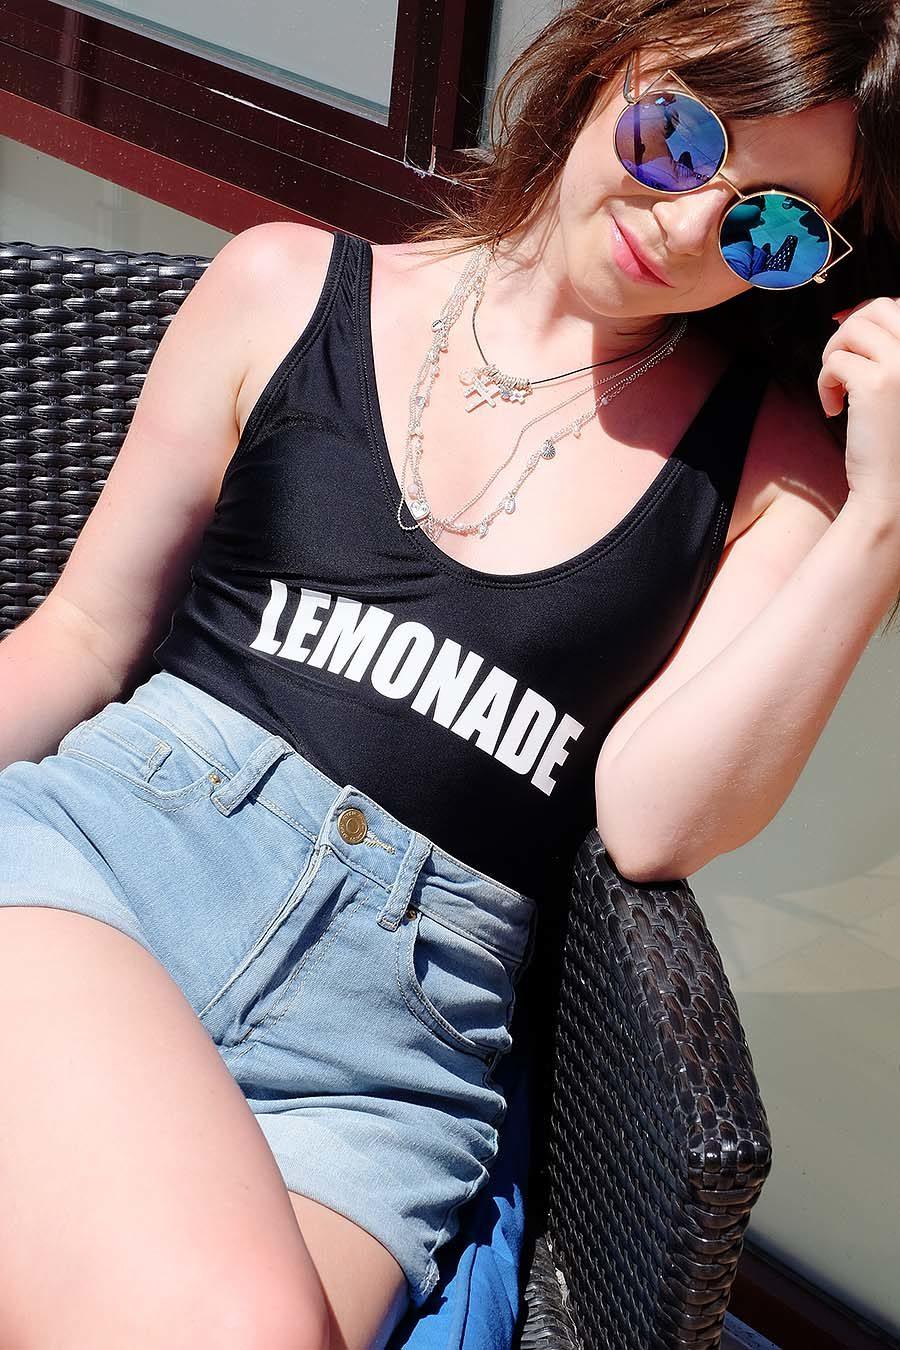 Badeanzug-stylische-Sommer-Outfits-summer-style